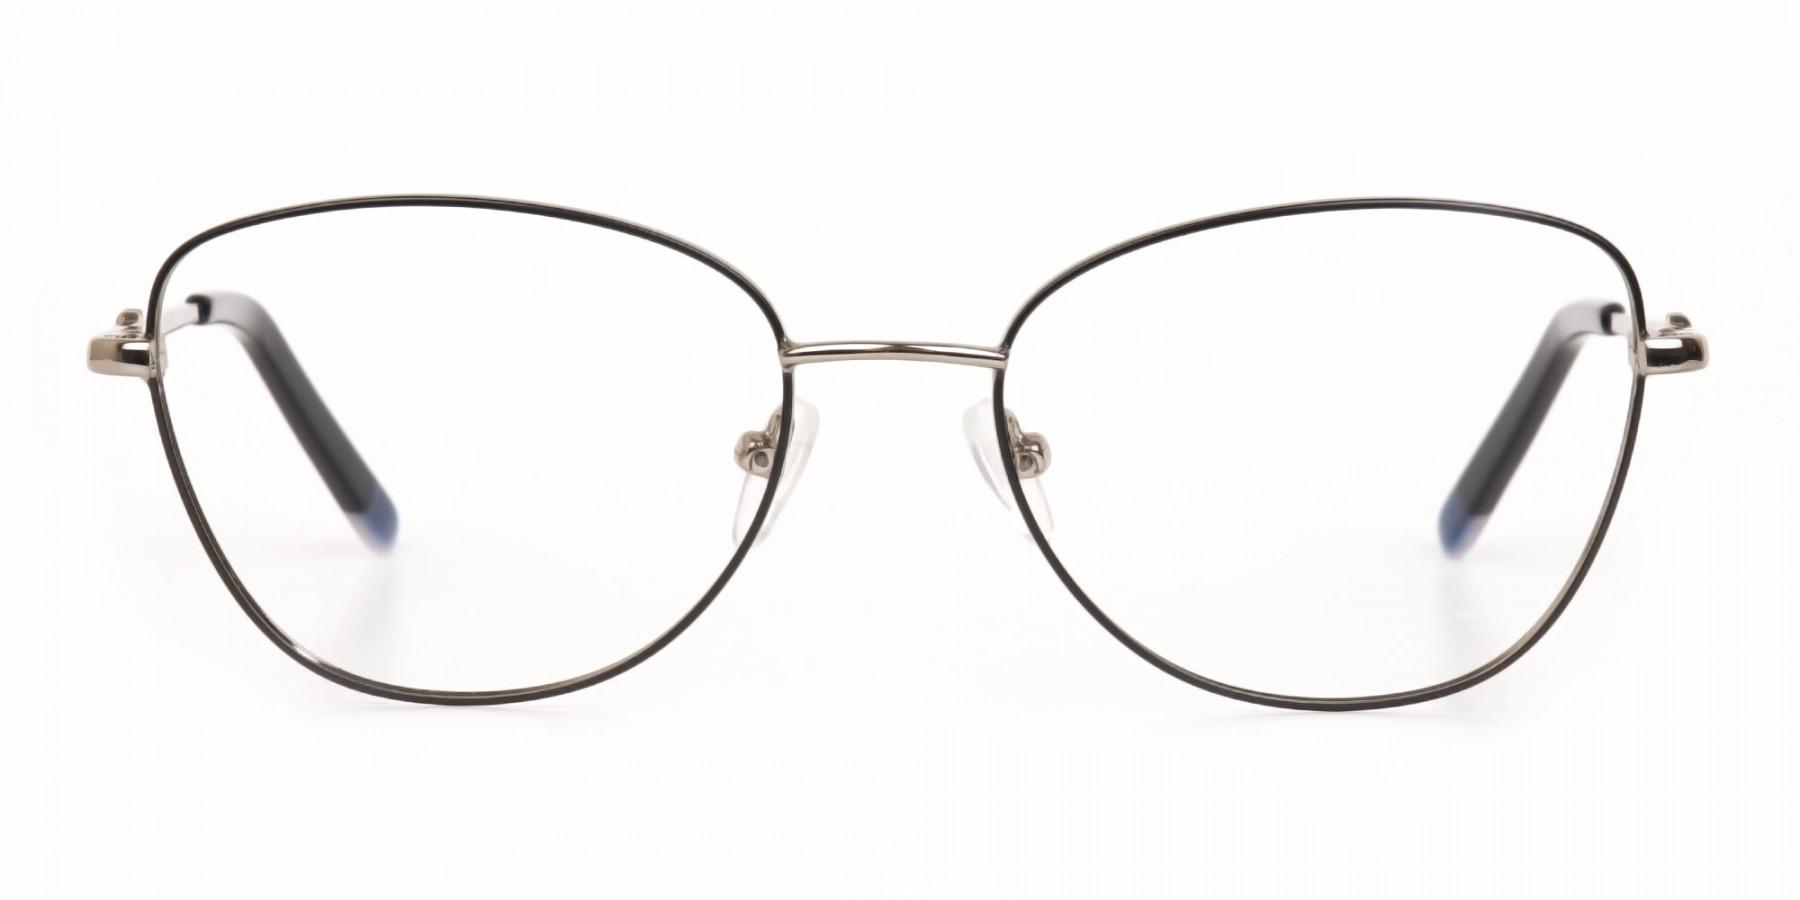 Black & Silver Metal Cat Eye Glasses Women-1